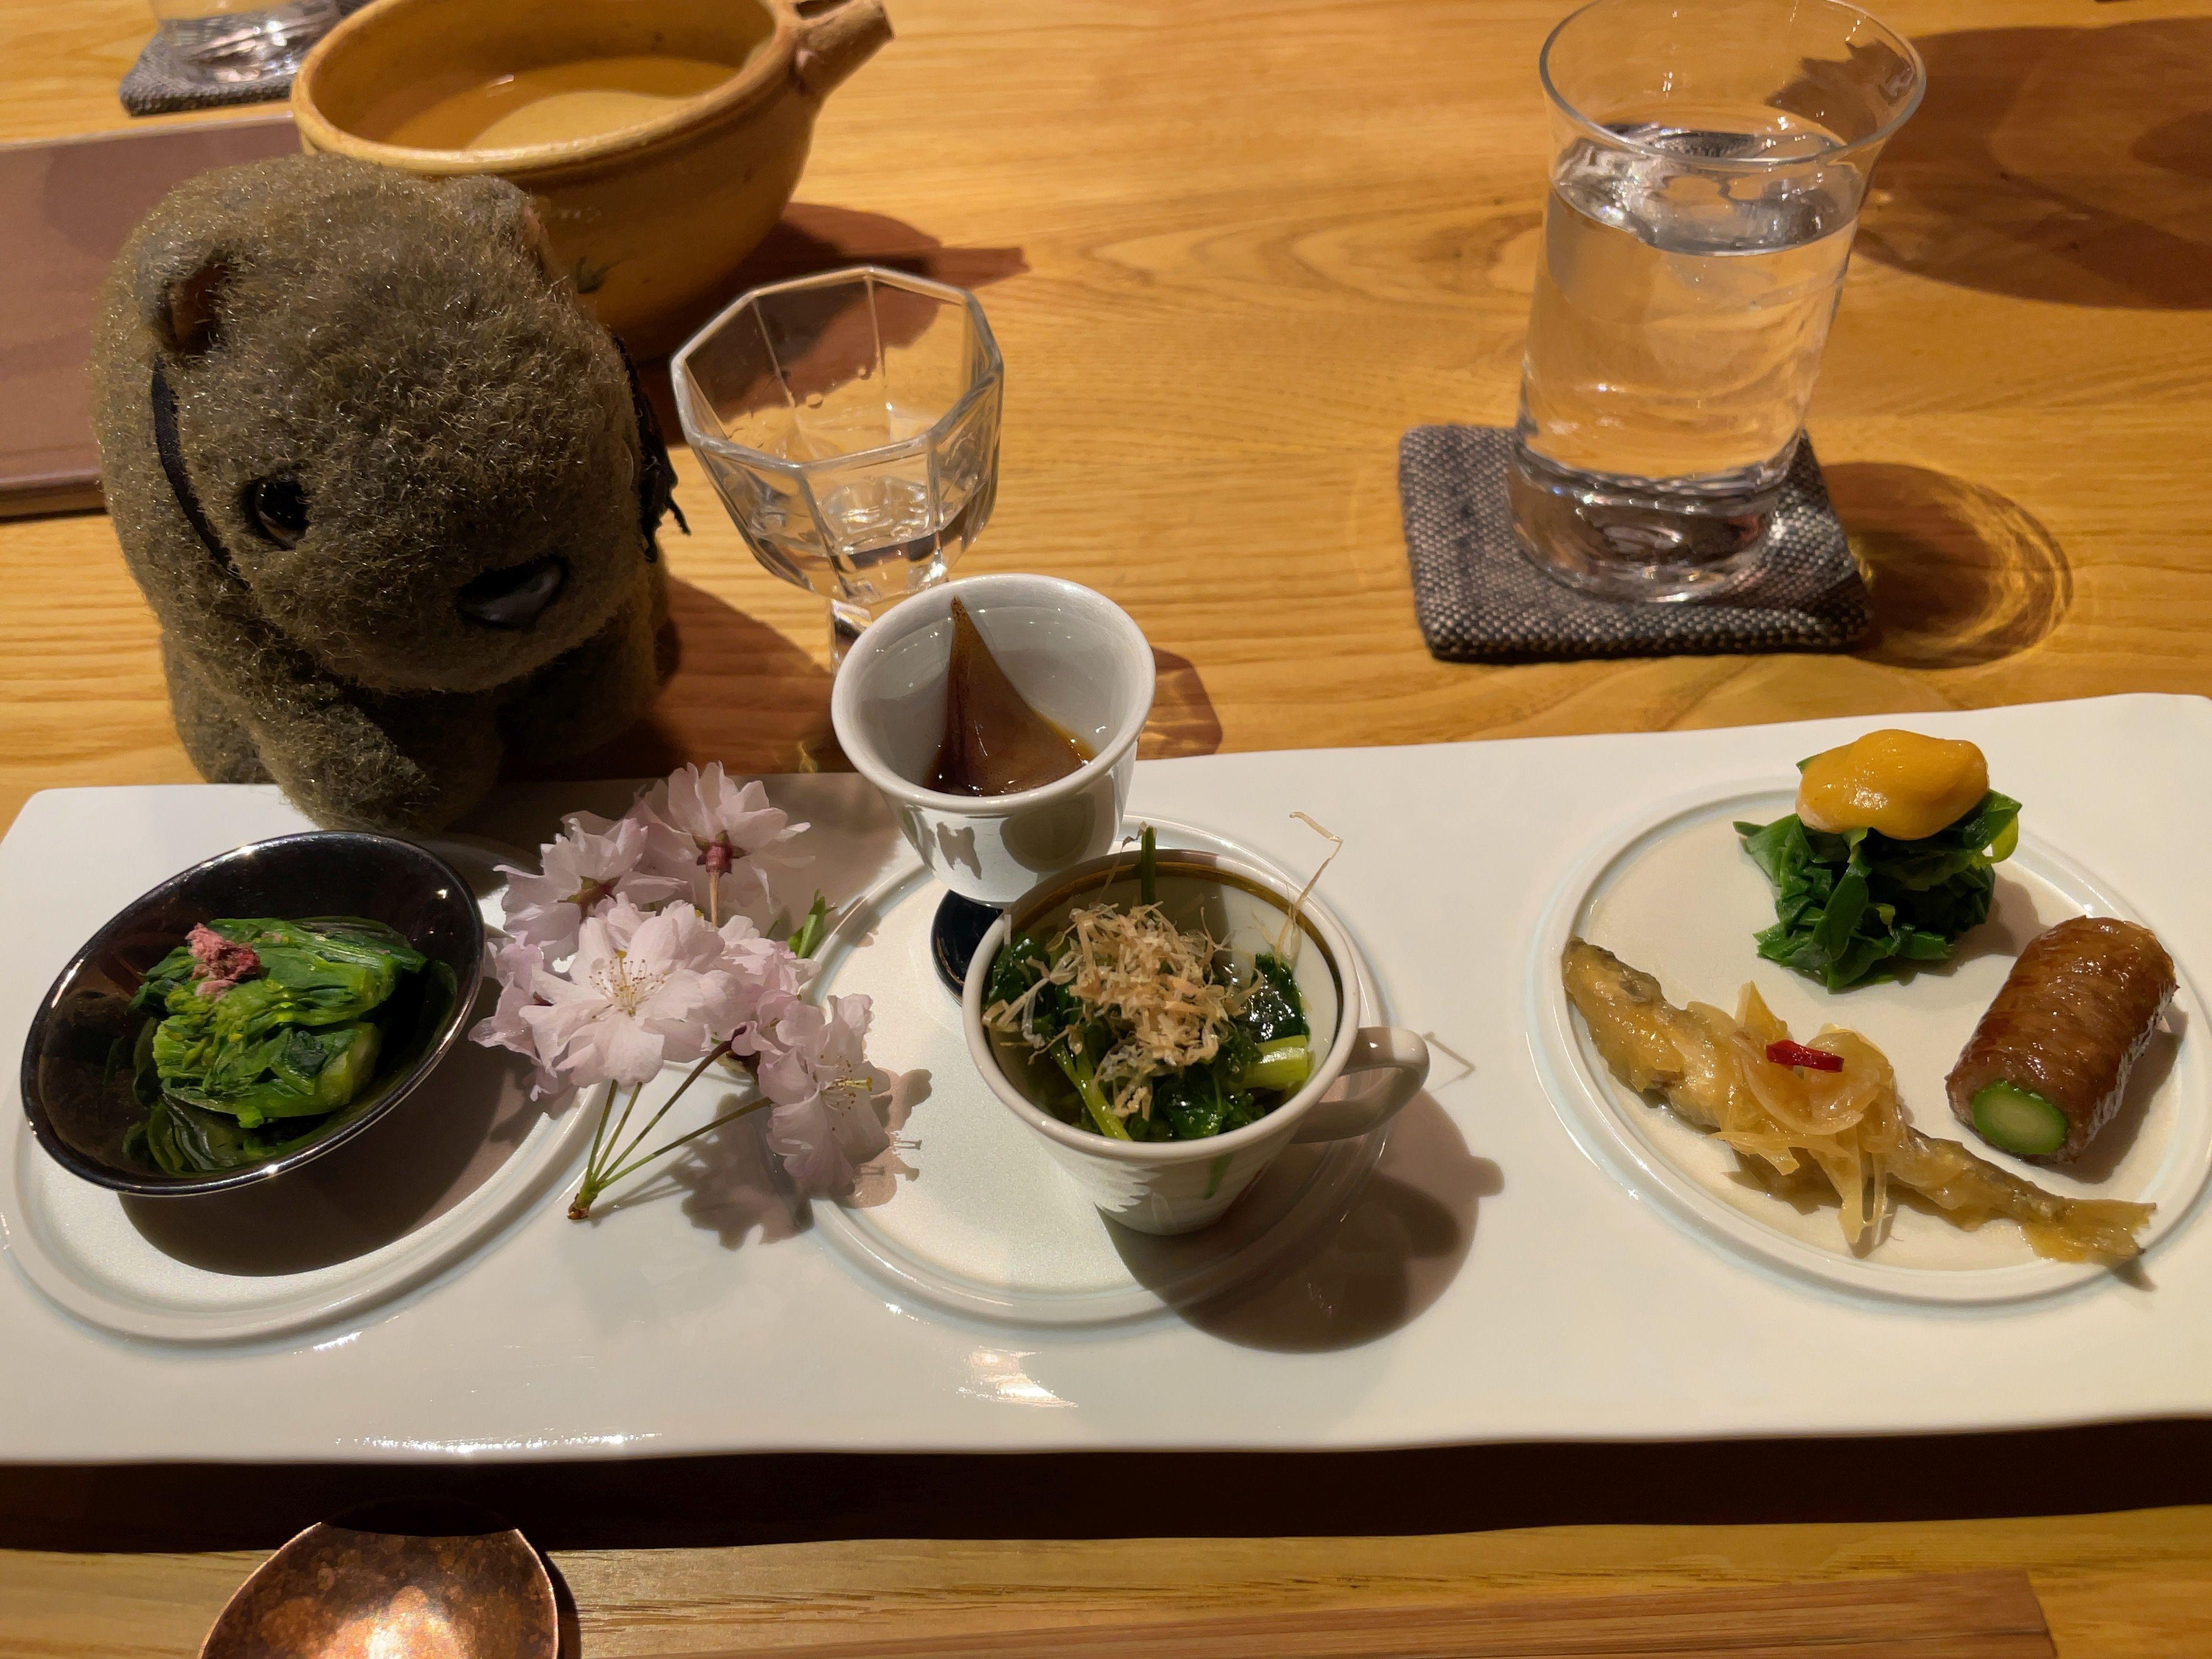 In Matsumoto